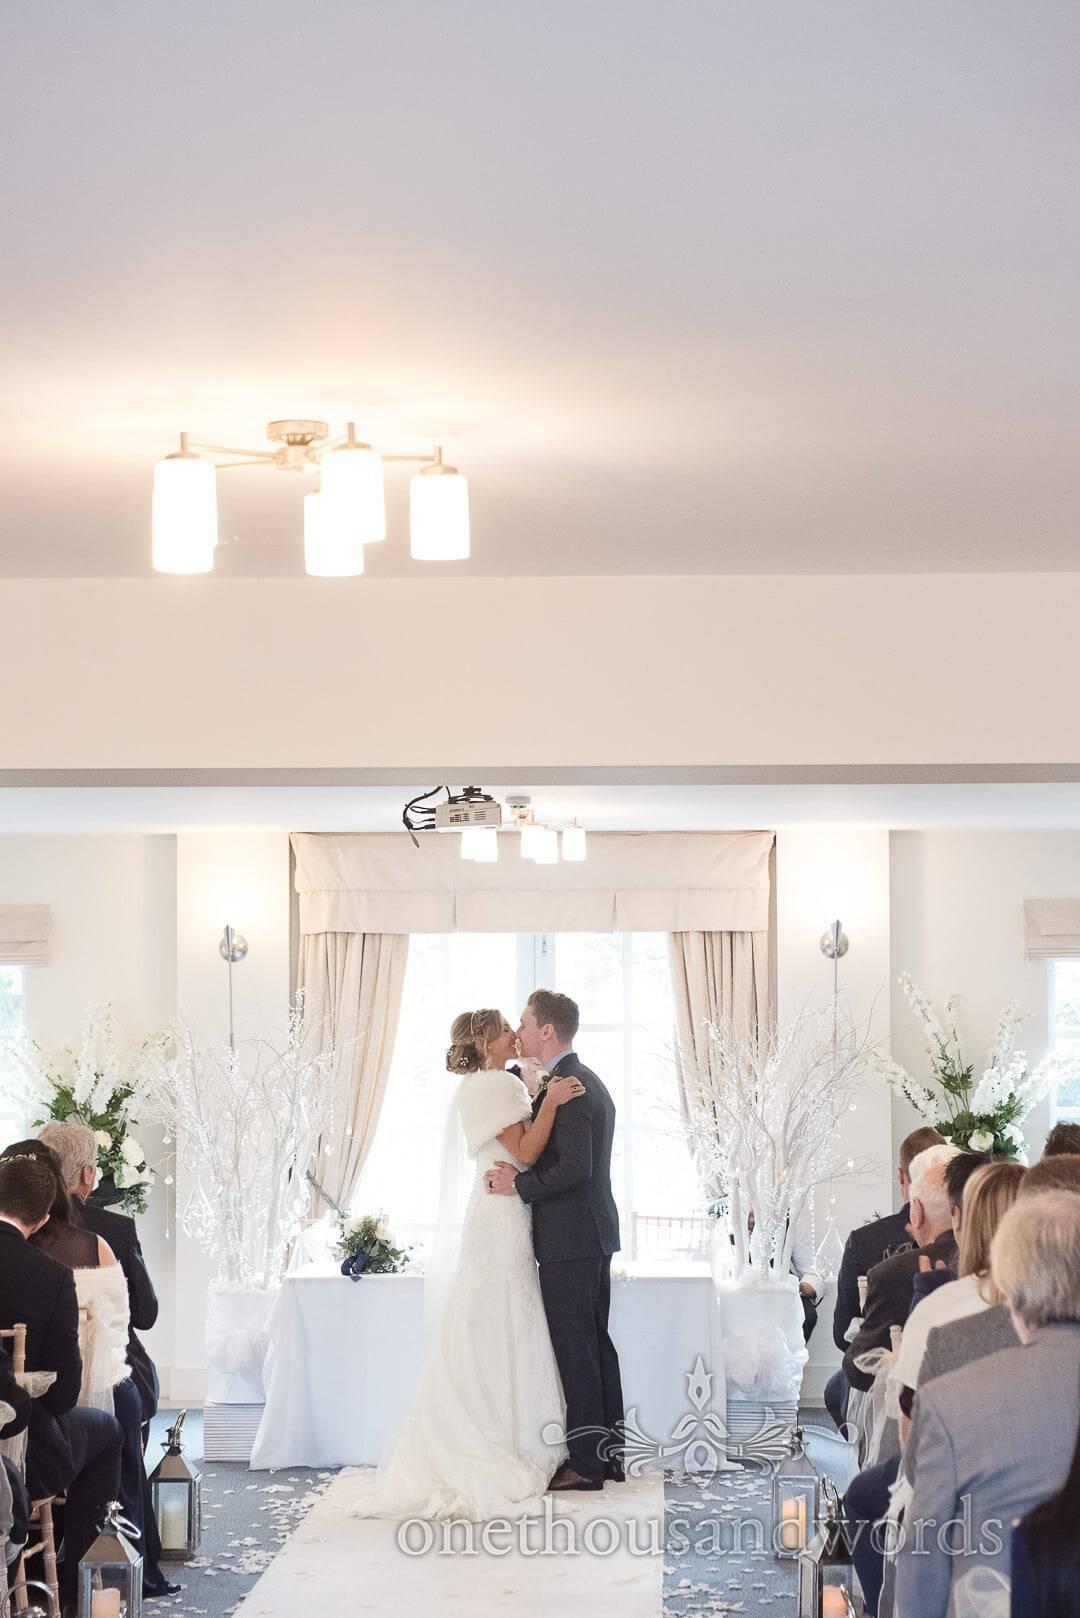 First Kiss at Winter Wonderland Italian Villa Wedding venue ceremony